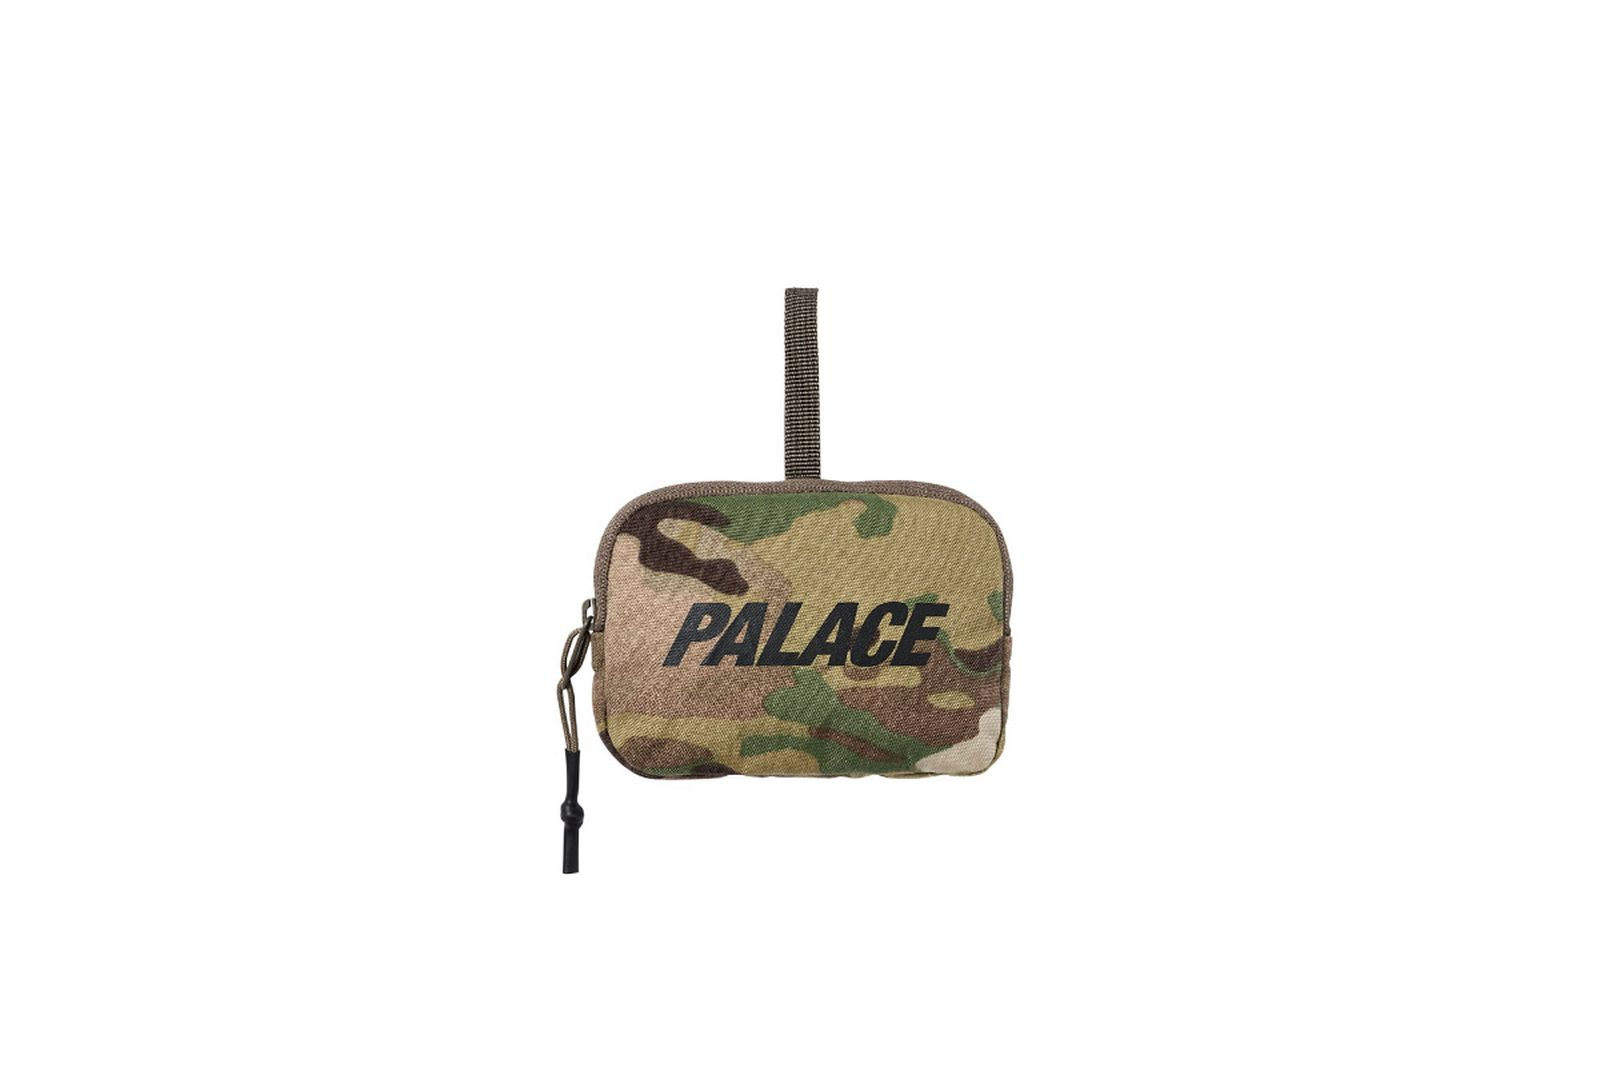 Palace 2019 Autumn Bag Flip Stash camo green 1996 TWEAKED